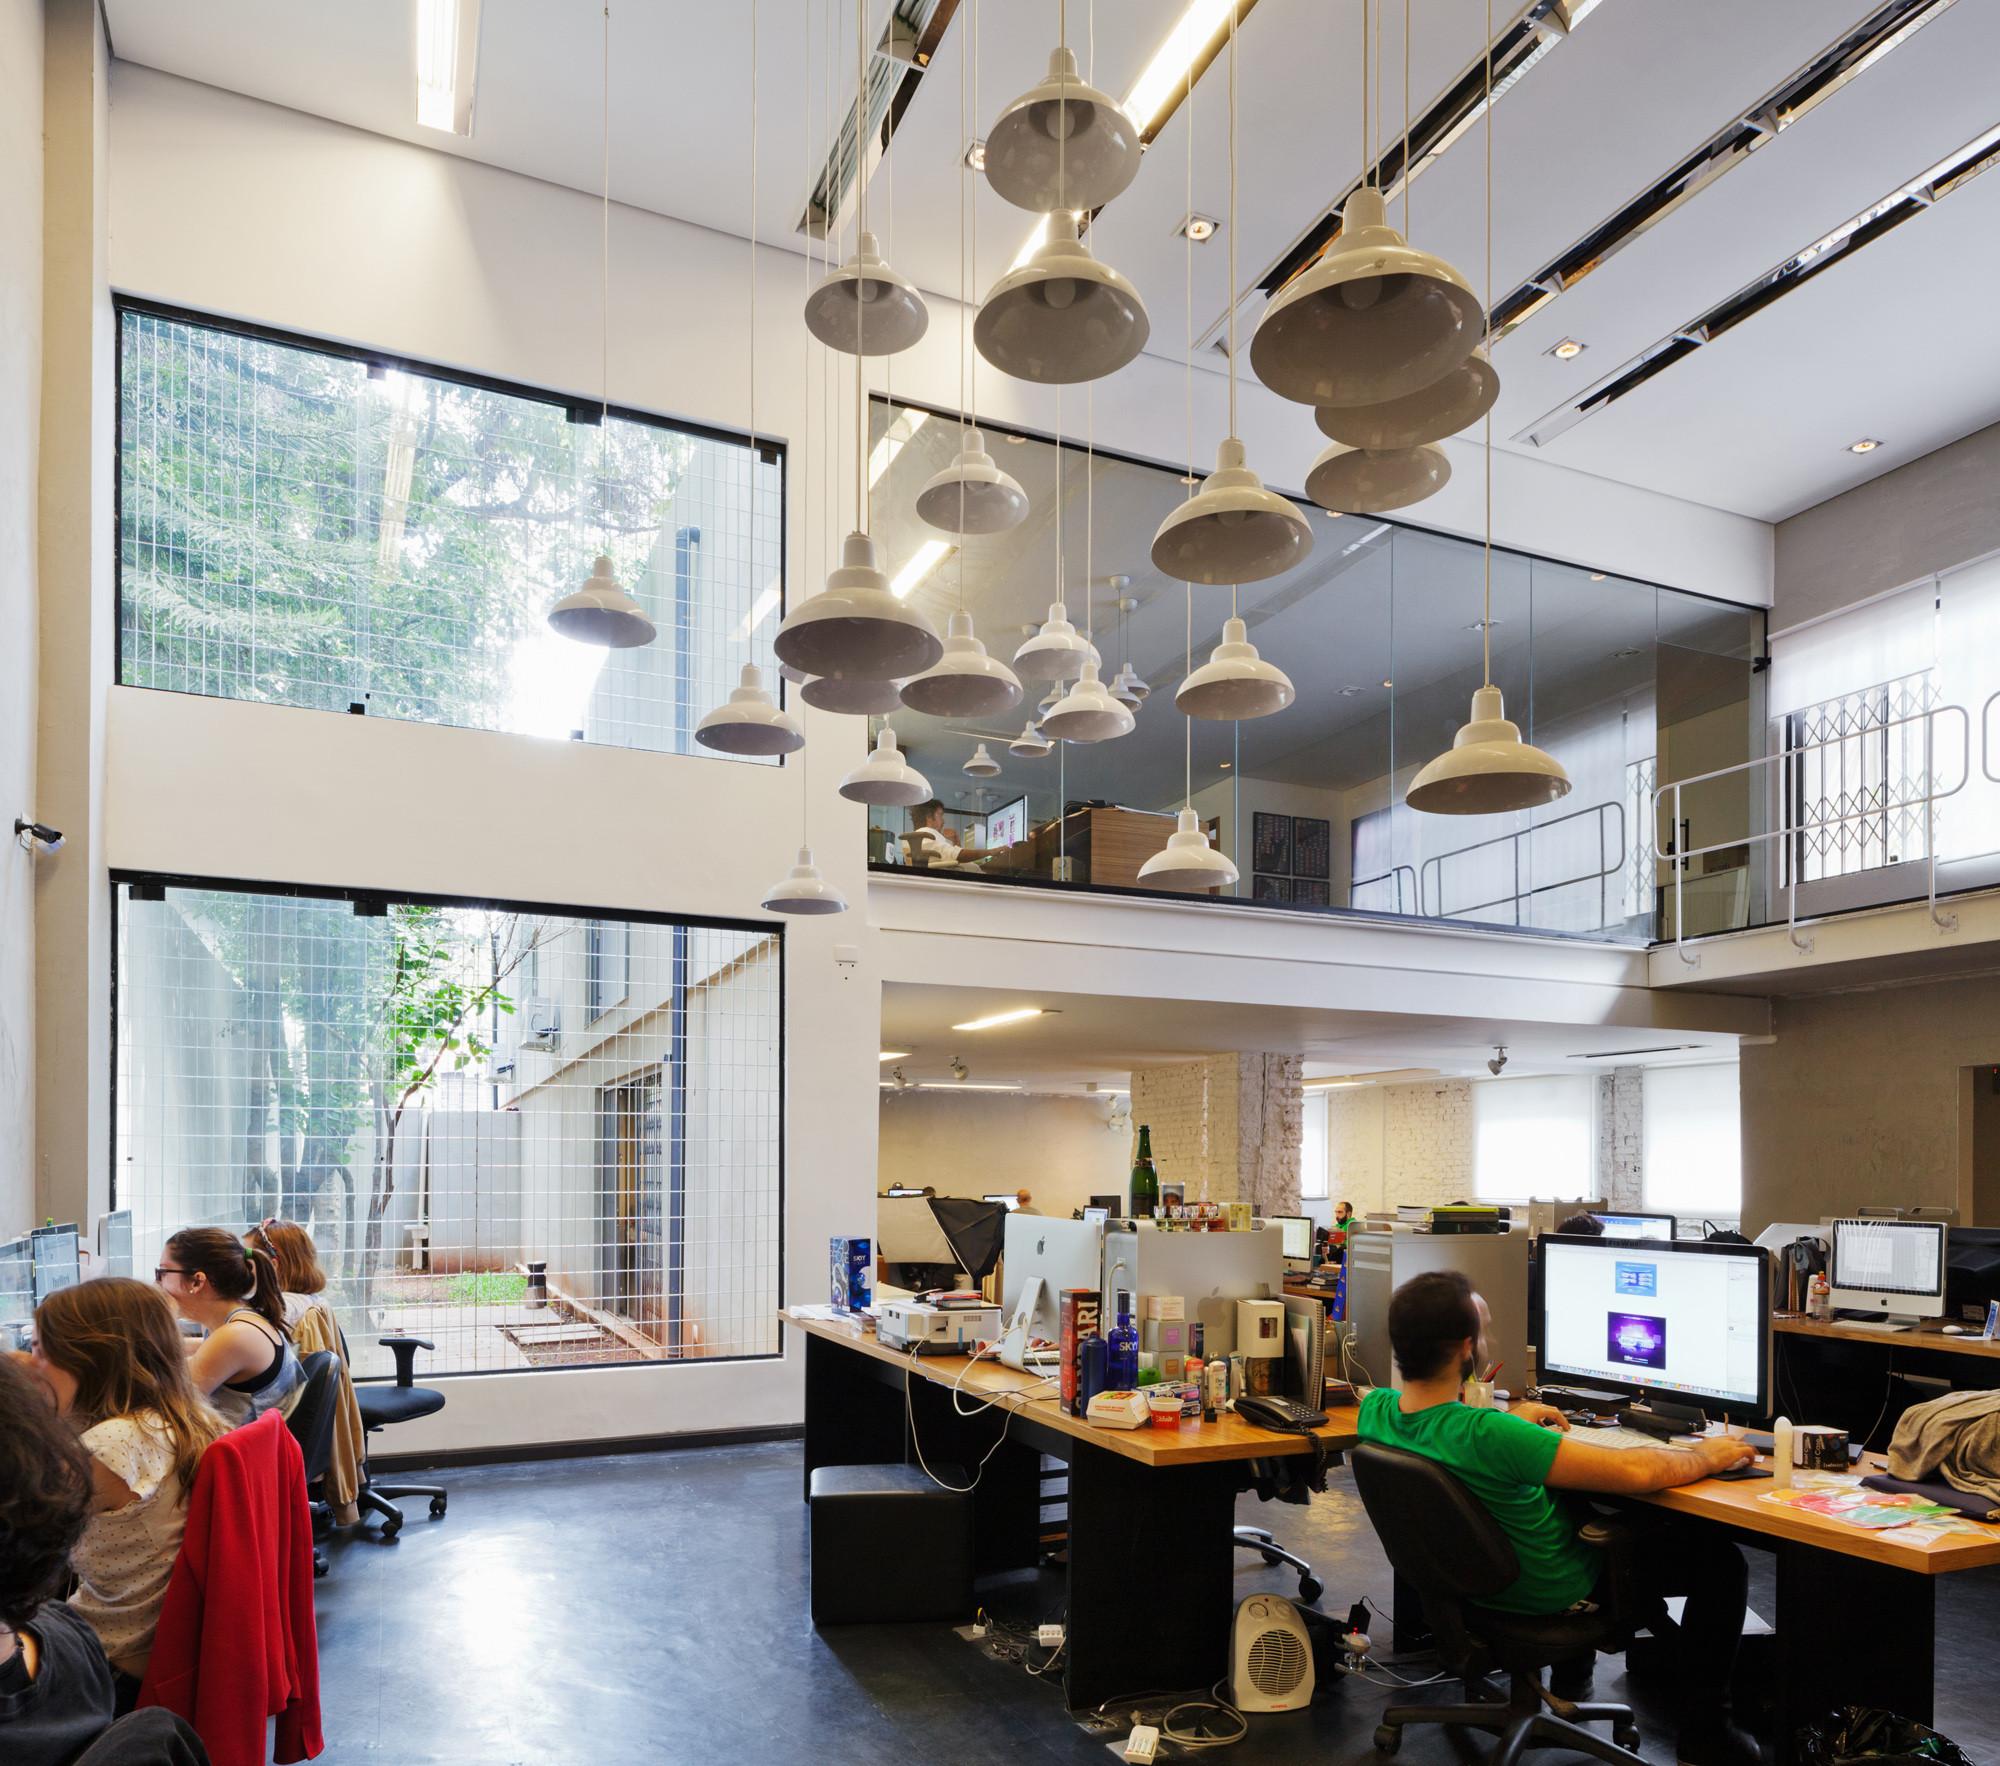 Galeria de casa rex fgmf arquitetos 4 for Escritorio arquitecto